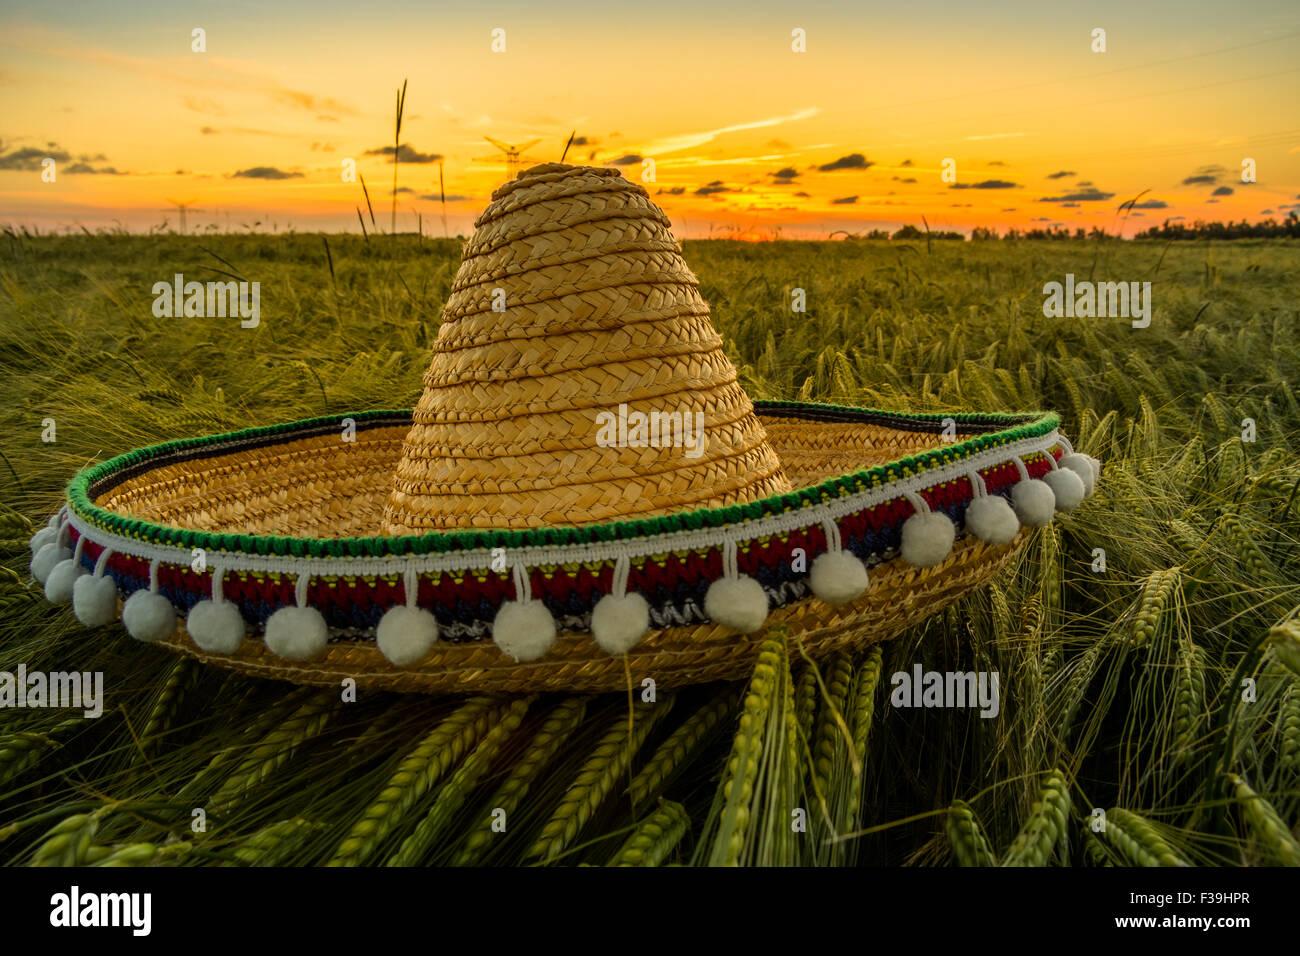 Sombrero-Hut an ein Gerstenfeld bei Sonnenuntergang Stockbild